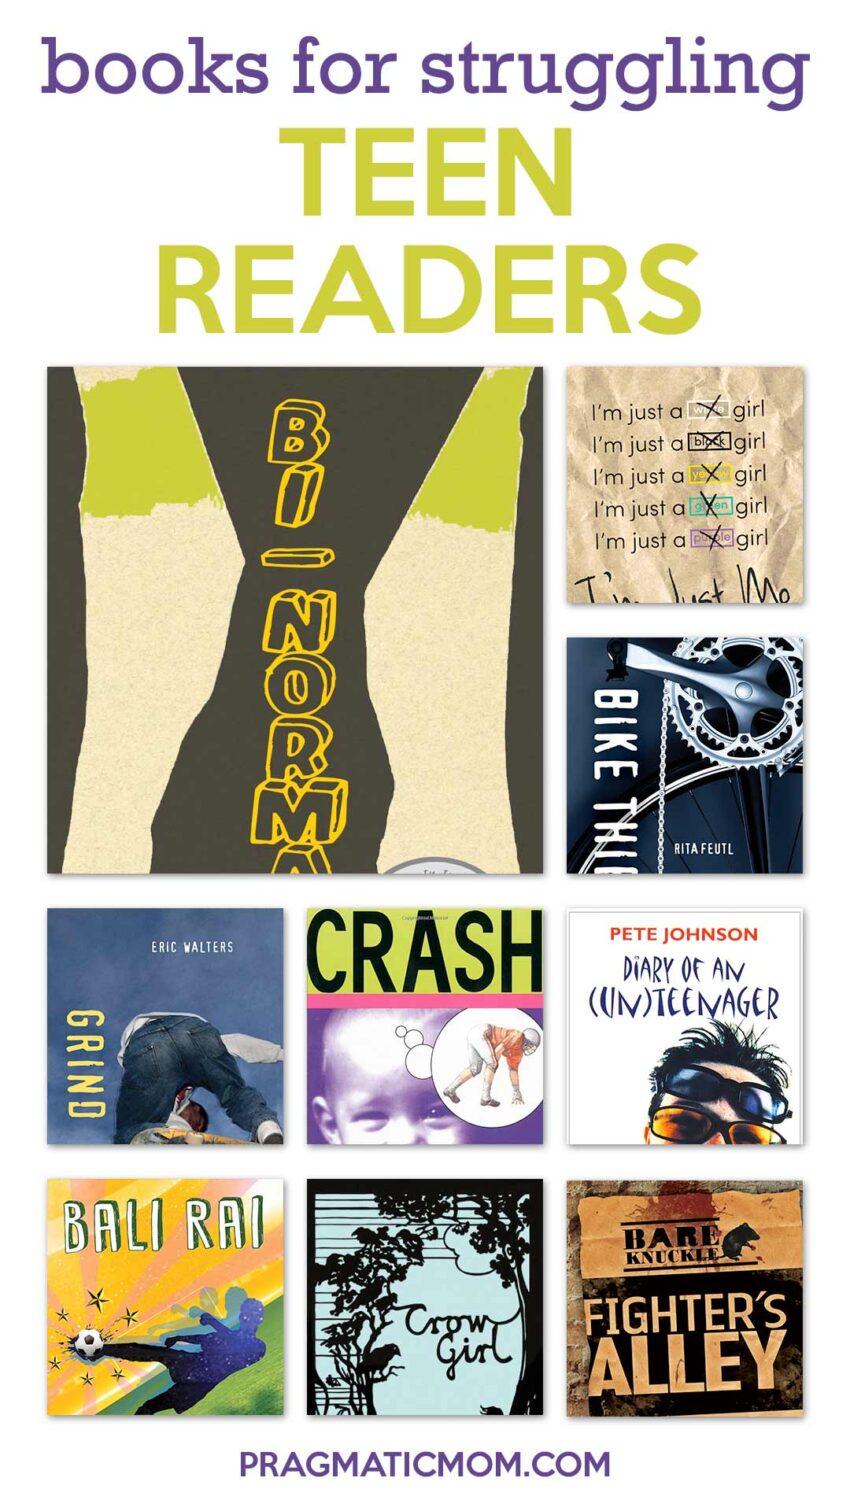 Books for Struggling Teen Readers